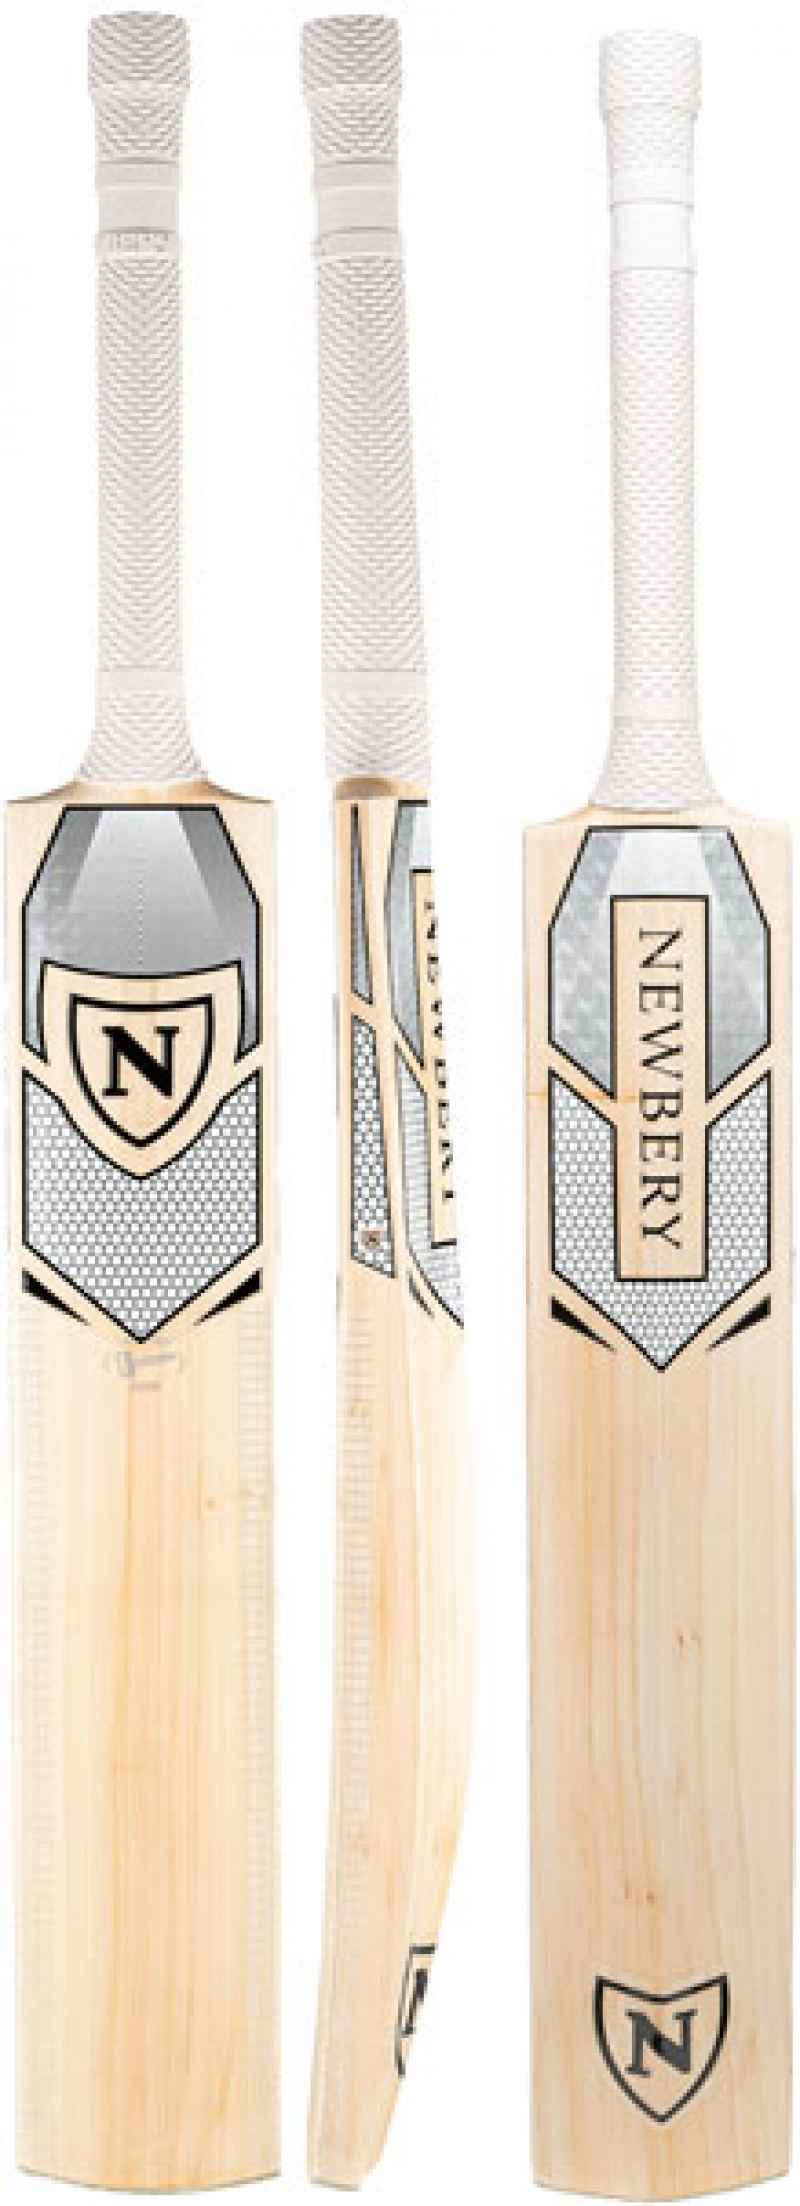 Newbery N Series (White) Cricket Bat